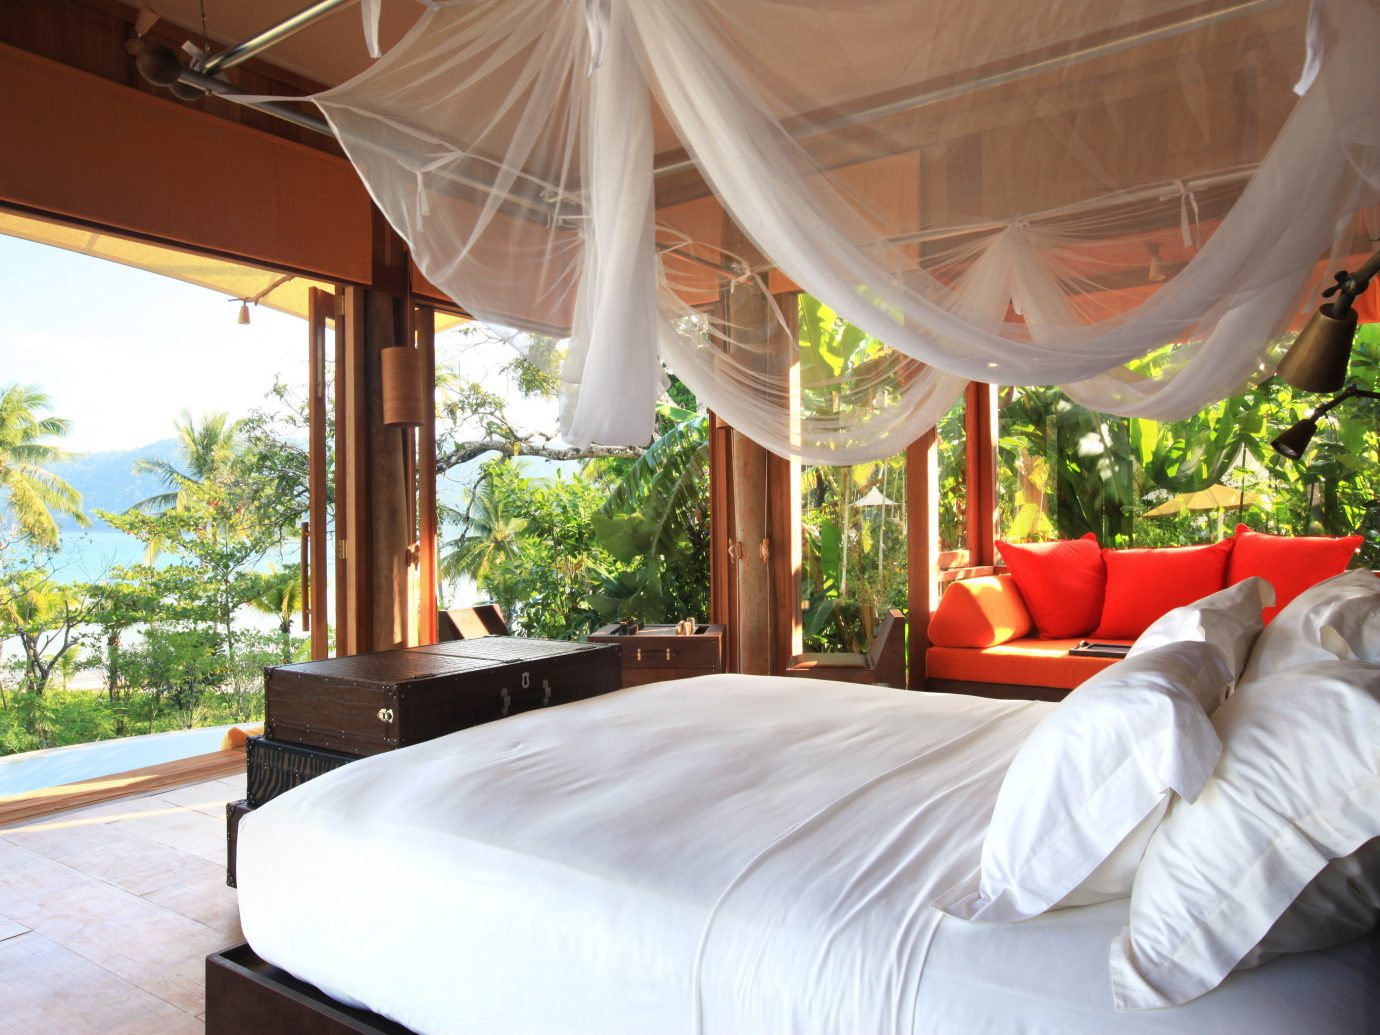 Bedroom view at Soneva Kiri, Koh Kut, Thailand